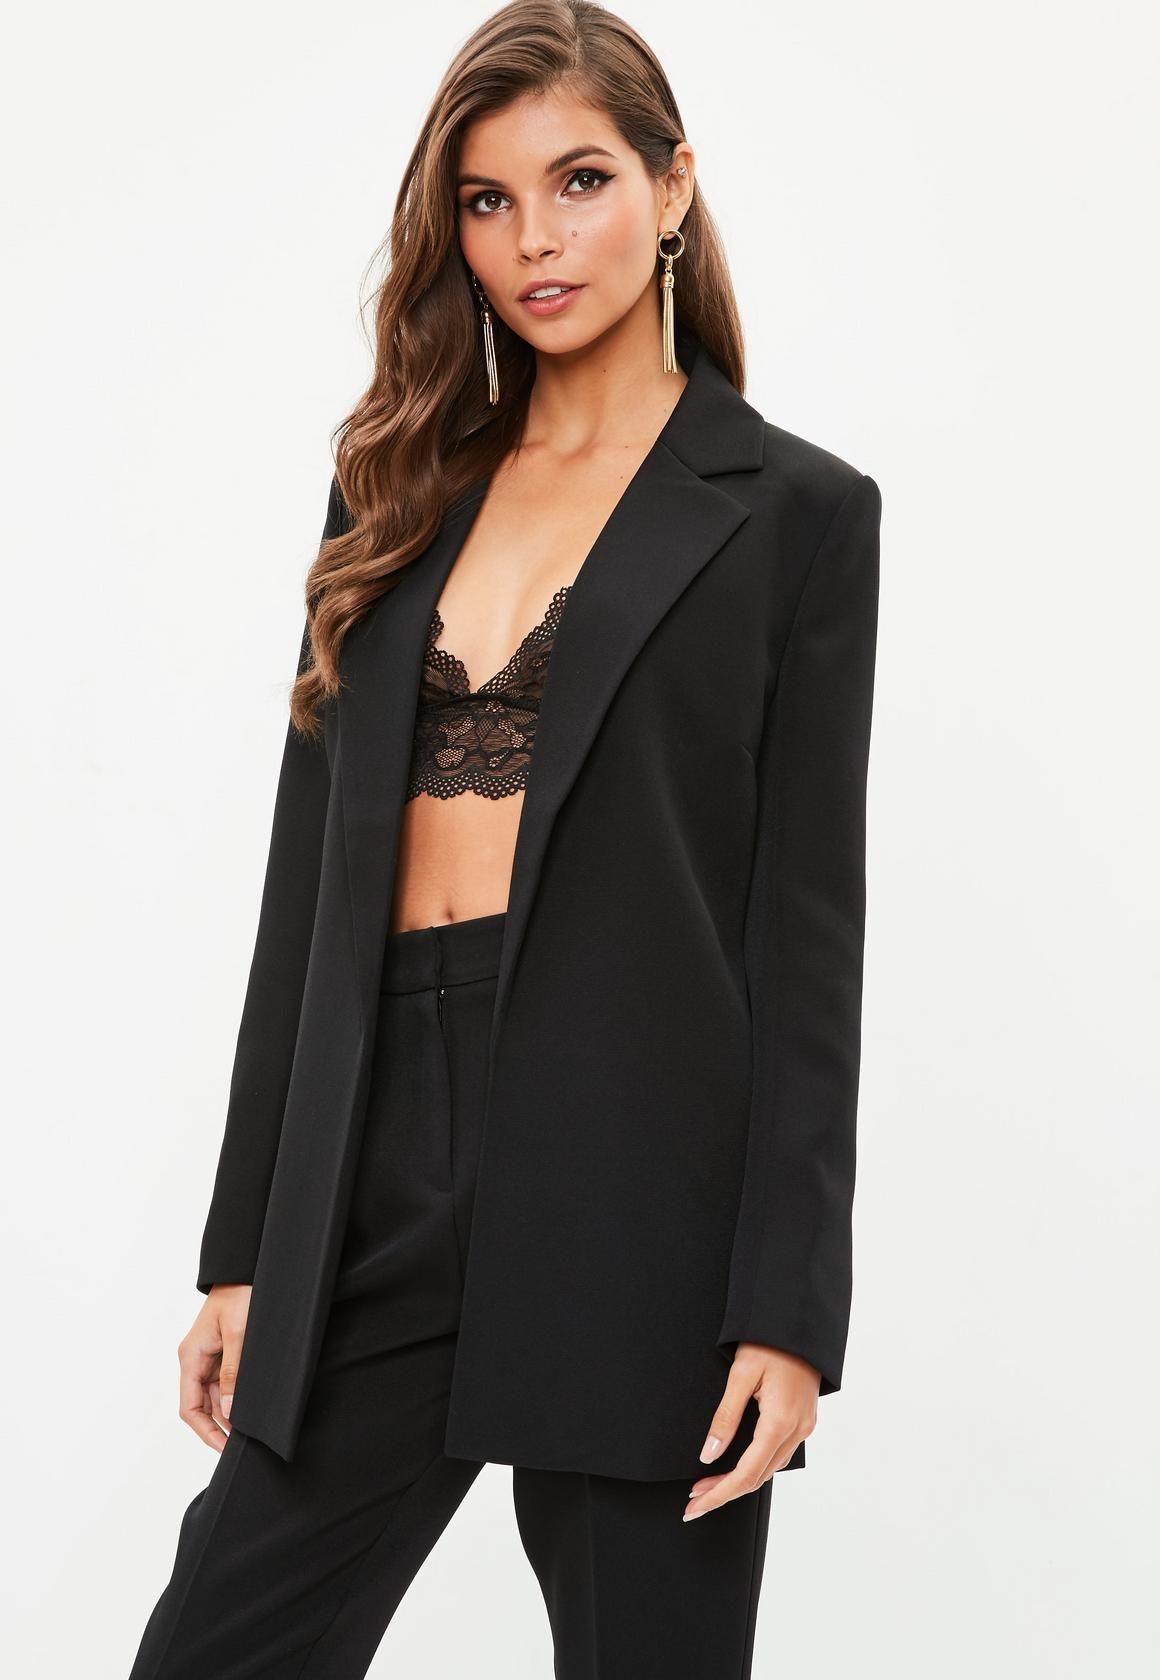 Missguided Black Boyfriend Blazer 60 00 Coats For Women Blazer Outfits Fashion [ 1680 x 1160 Pixel ]